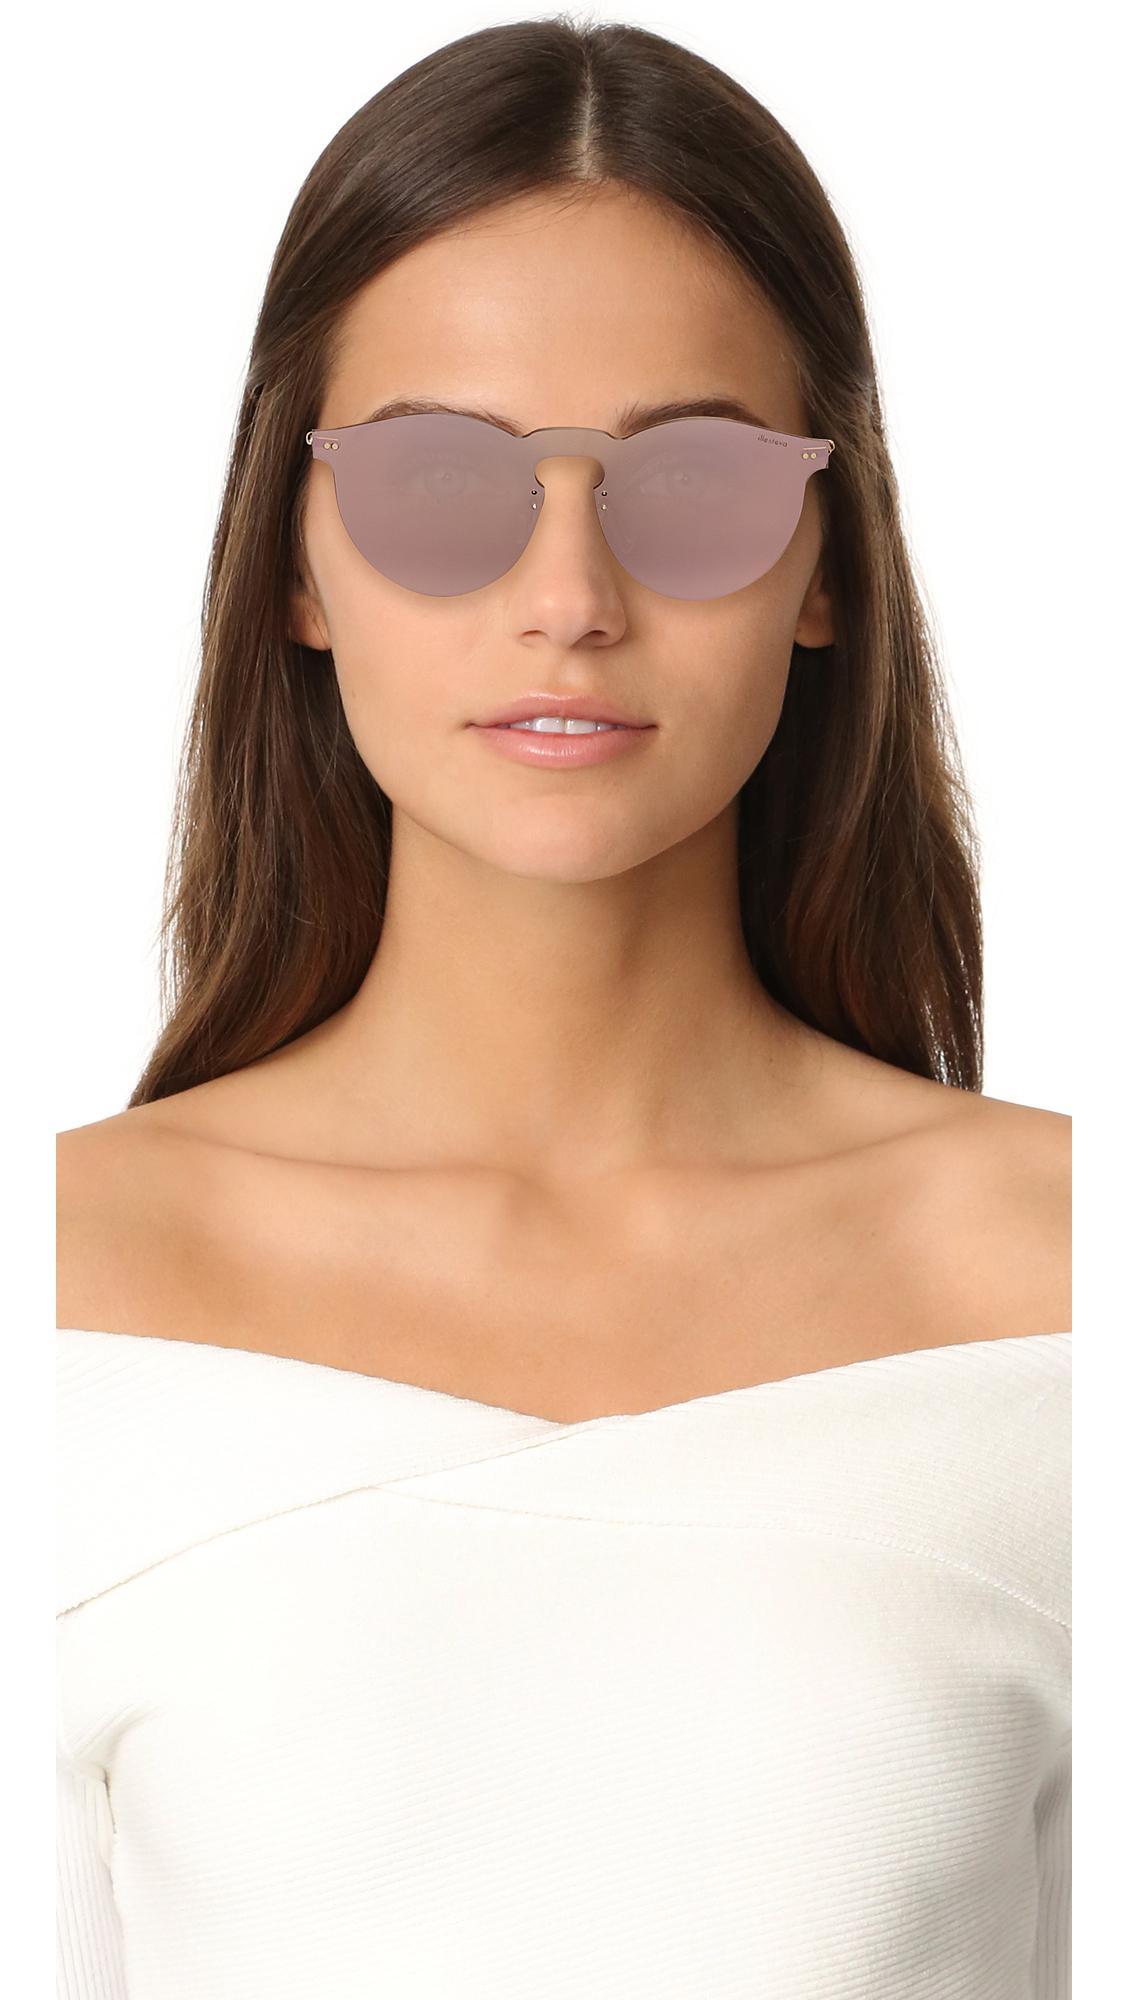 a7b041c0c0 Lyst - Illesteva Leonard Mask Sunglasses in Pink